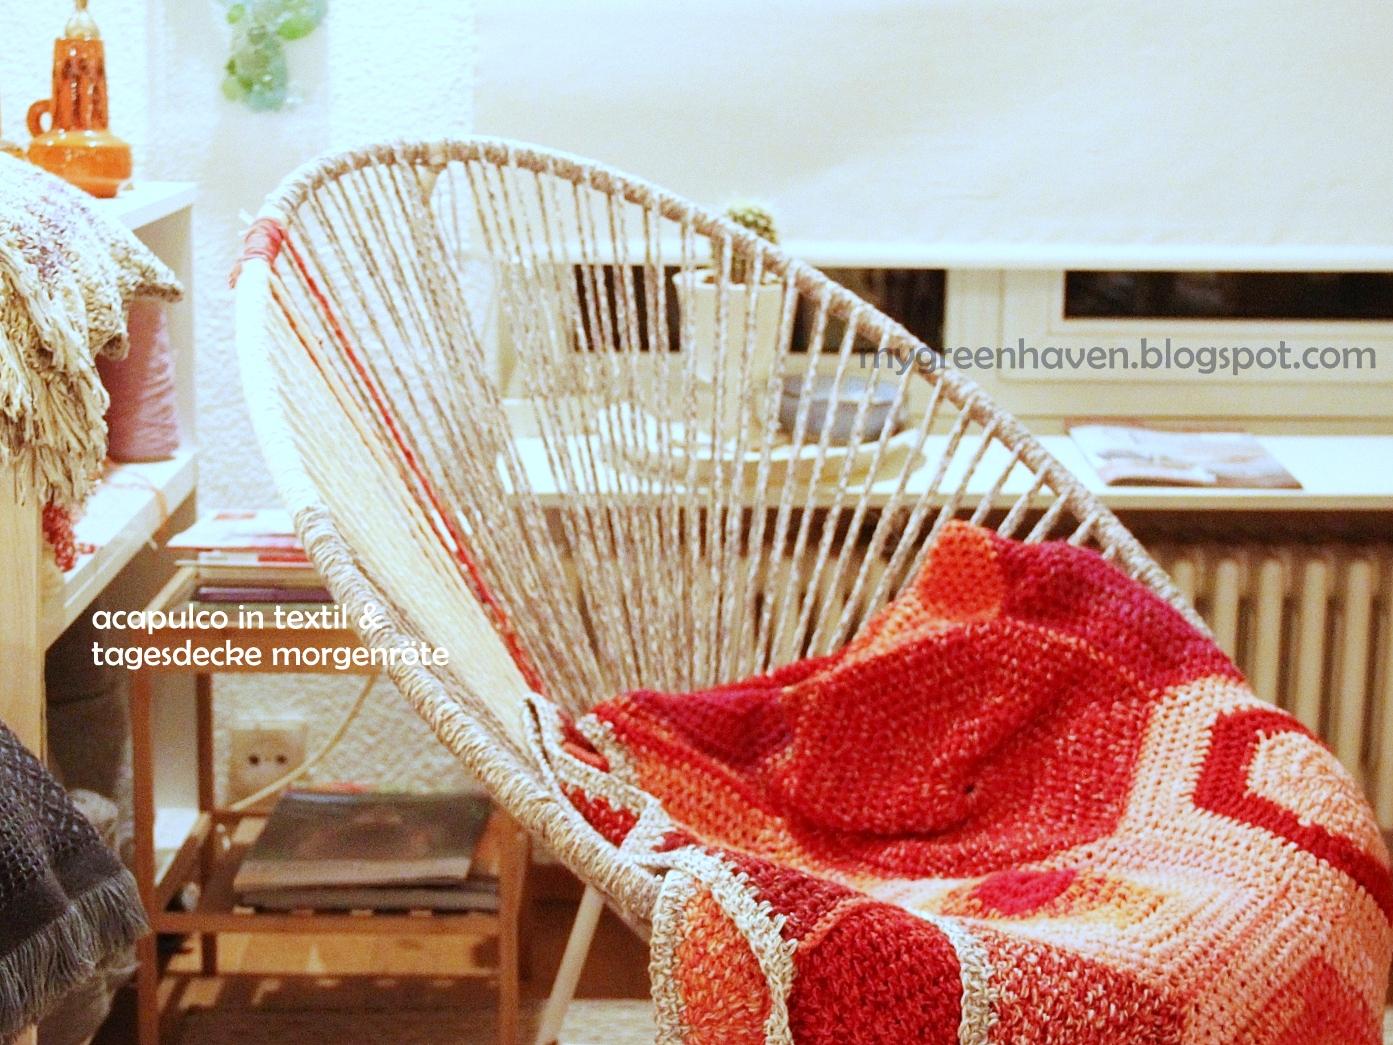 stringchair remodeling mal zwei. Black Bedroom Furniture Sets. Home Design Ideas